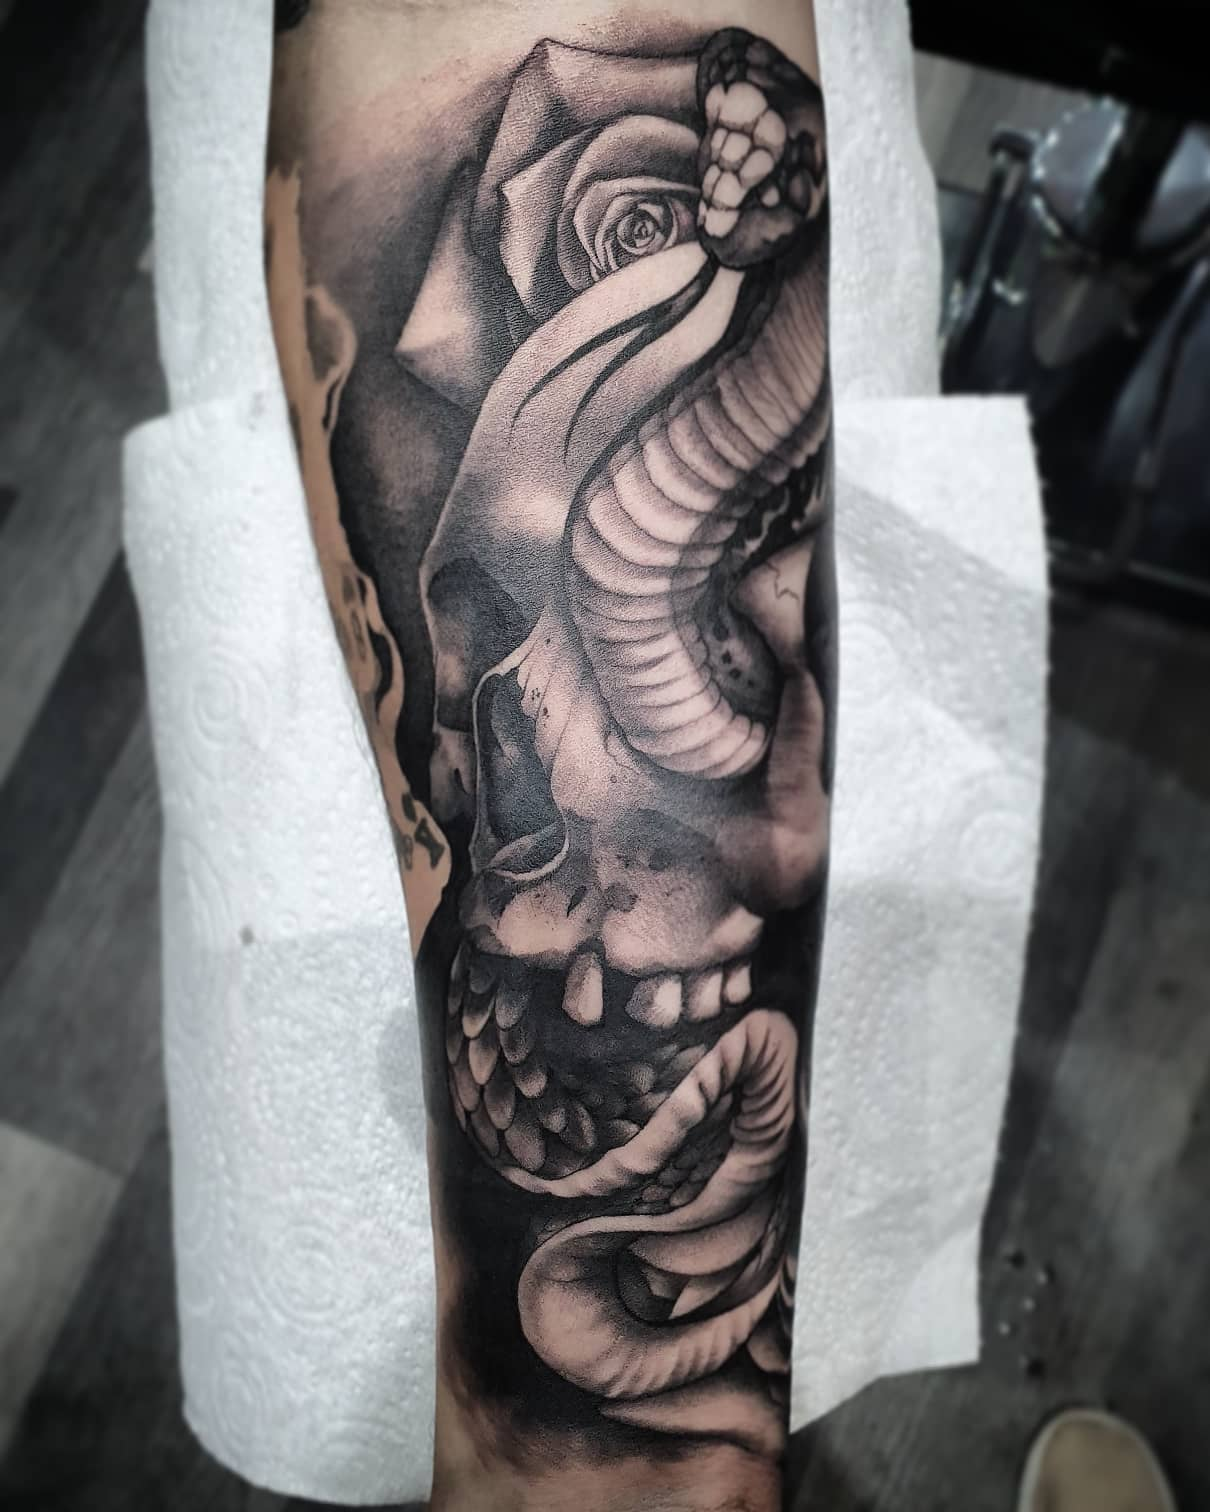 Until next time @vidalocatattoobolton 🏻 _______________________________ tattoo artdriven stencilstuff edinburghtattooartist studioxiii silverbackink btattooing onlythedarkest tattooartist tattooartistuk edinburgh ink tattoos inked tattooed picoftheday art love pic photooftheday photo blackandgrey blackngrey instagram artist design tattooer